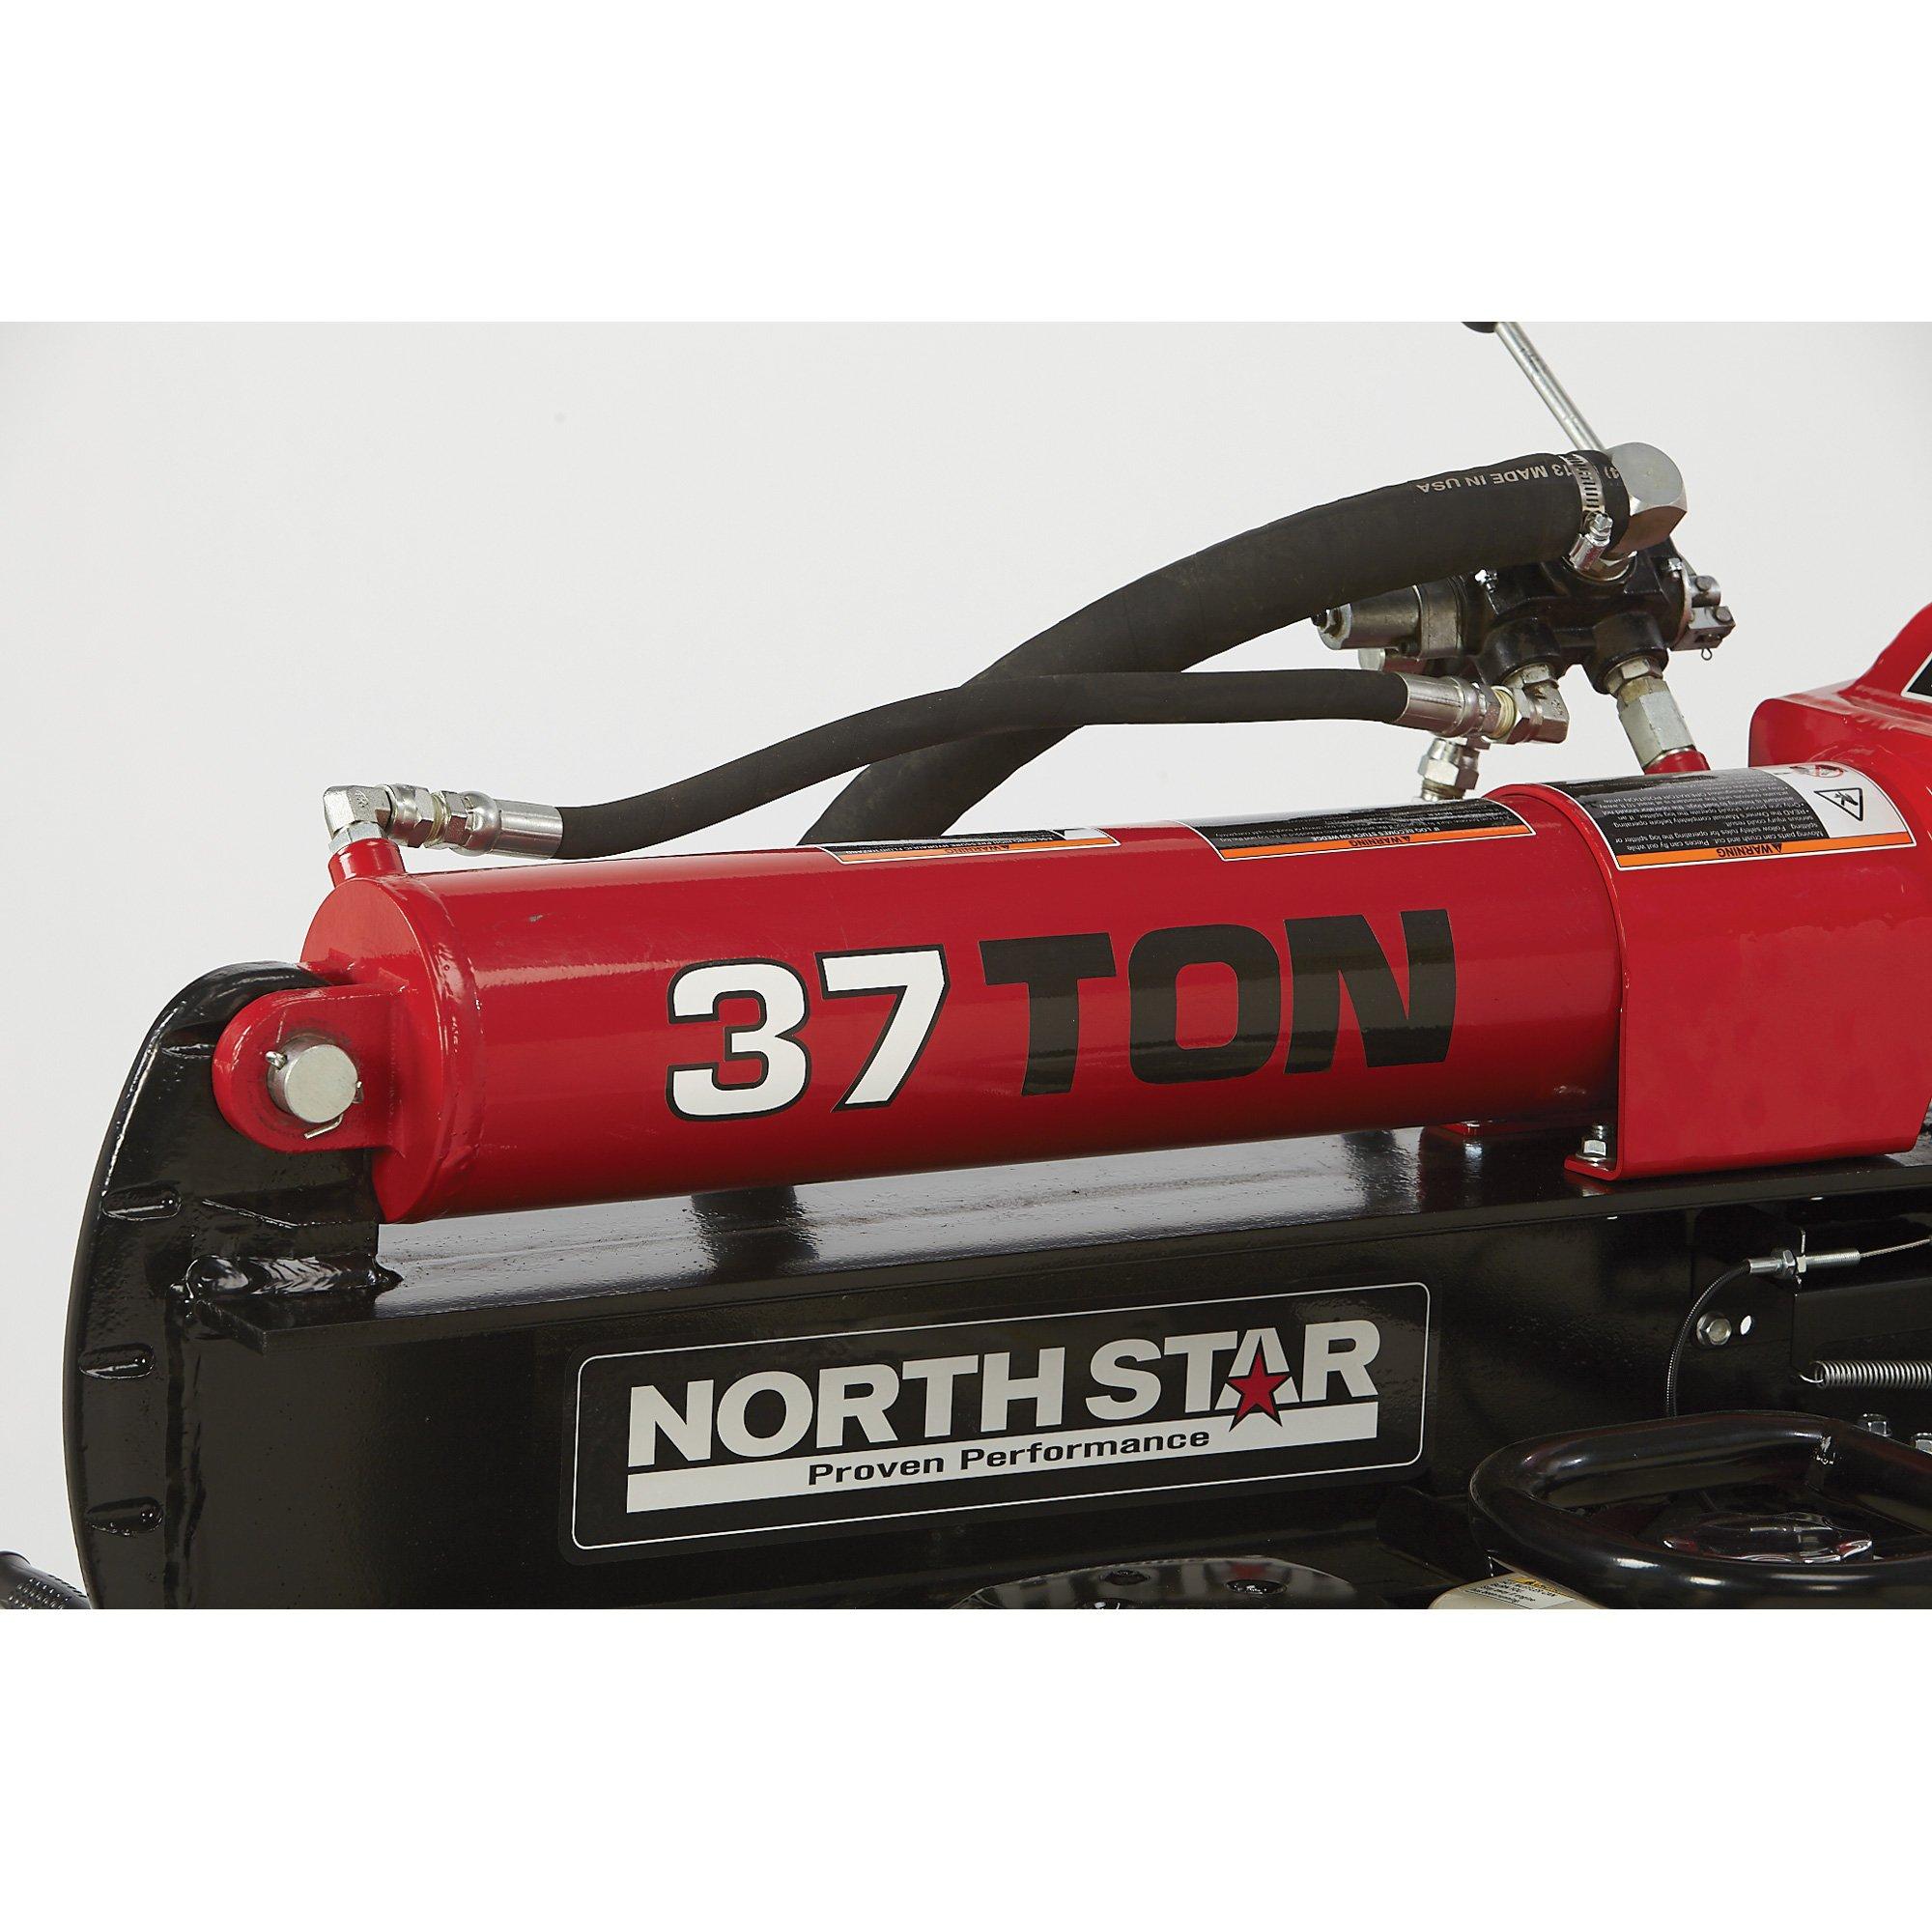 NorthStar Deluxe Horizontal/Vertical Log Splitter - 37-Ton Ram Force, 389cc Honda GX390 Engine by NorthStar